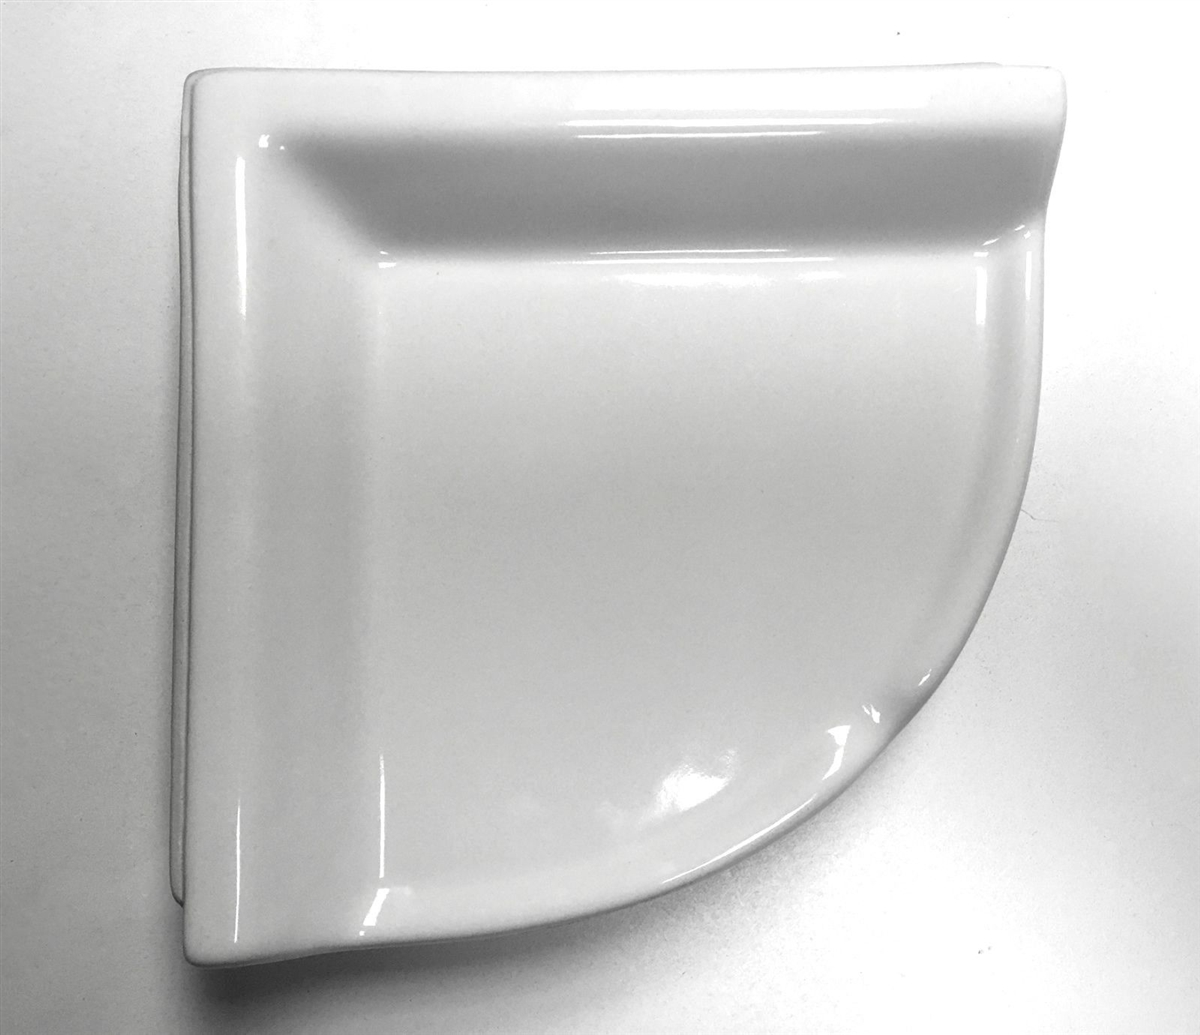 corner shelf white ceramic bath accessory shower thinset mount 8 3 4 x 2 5 8